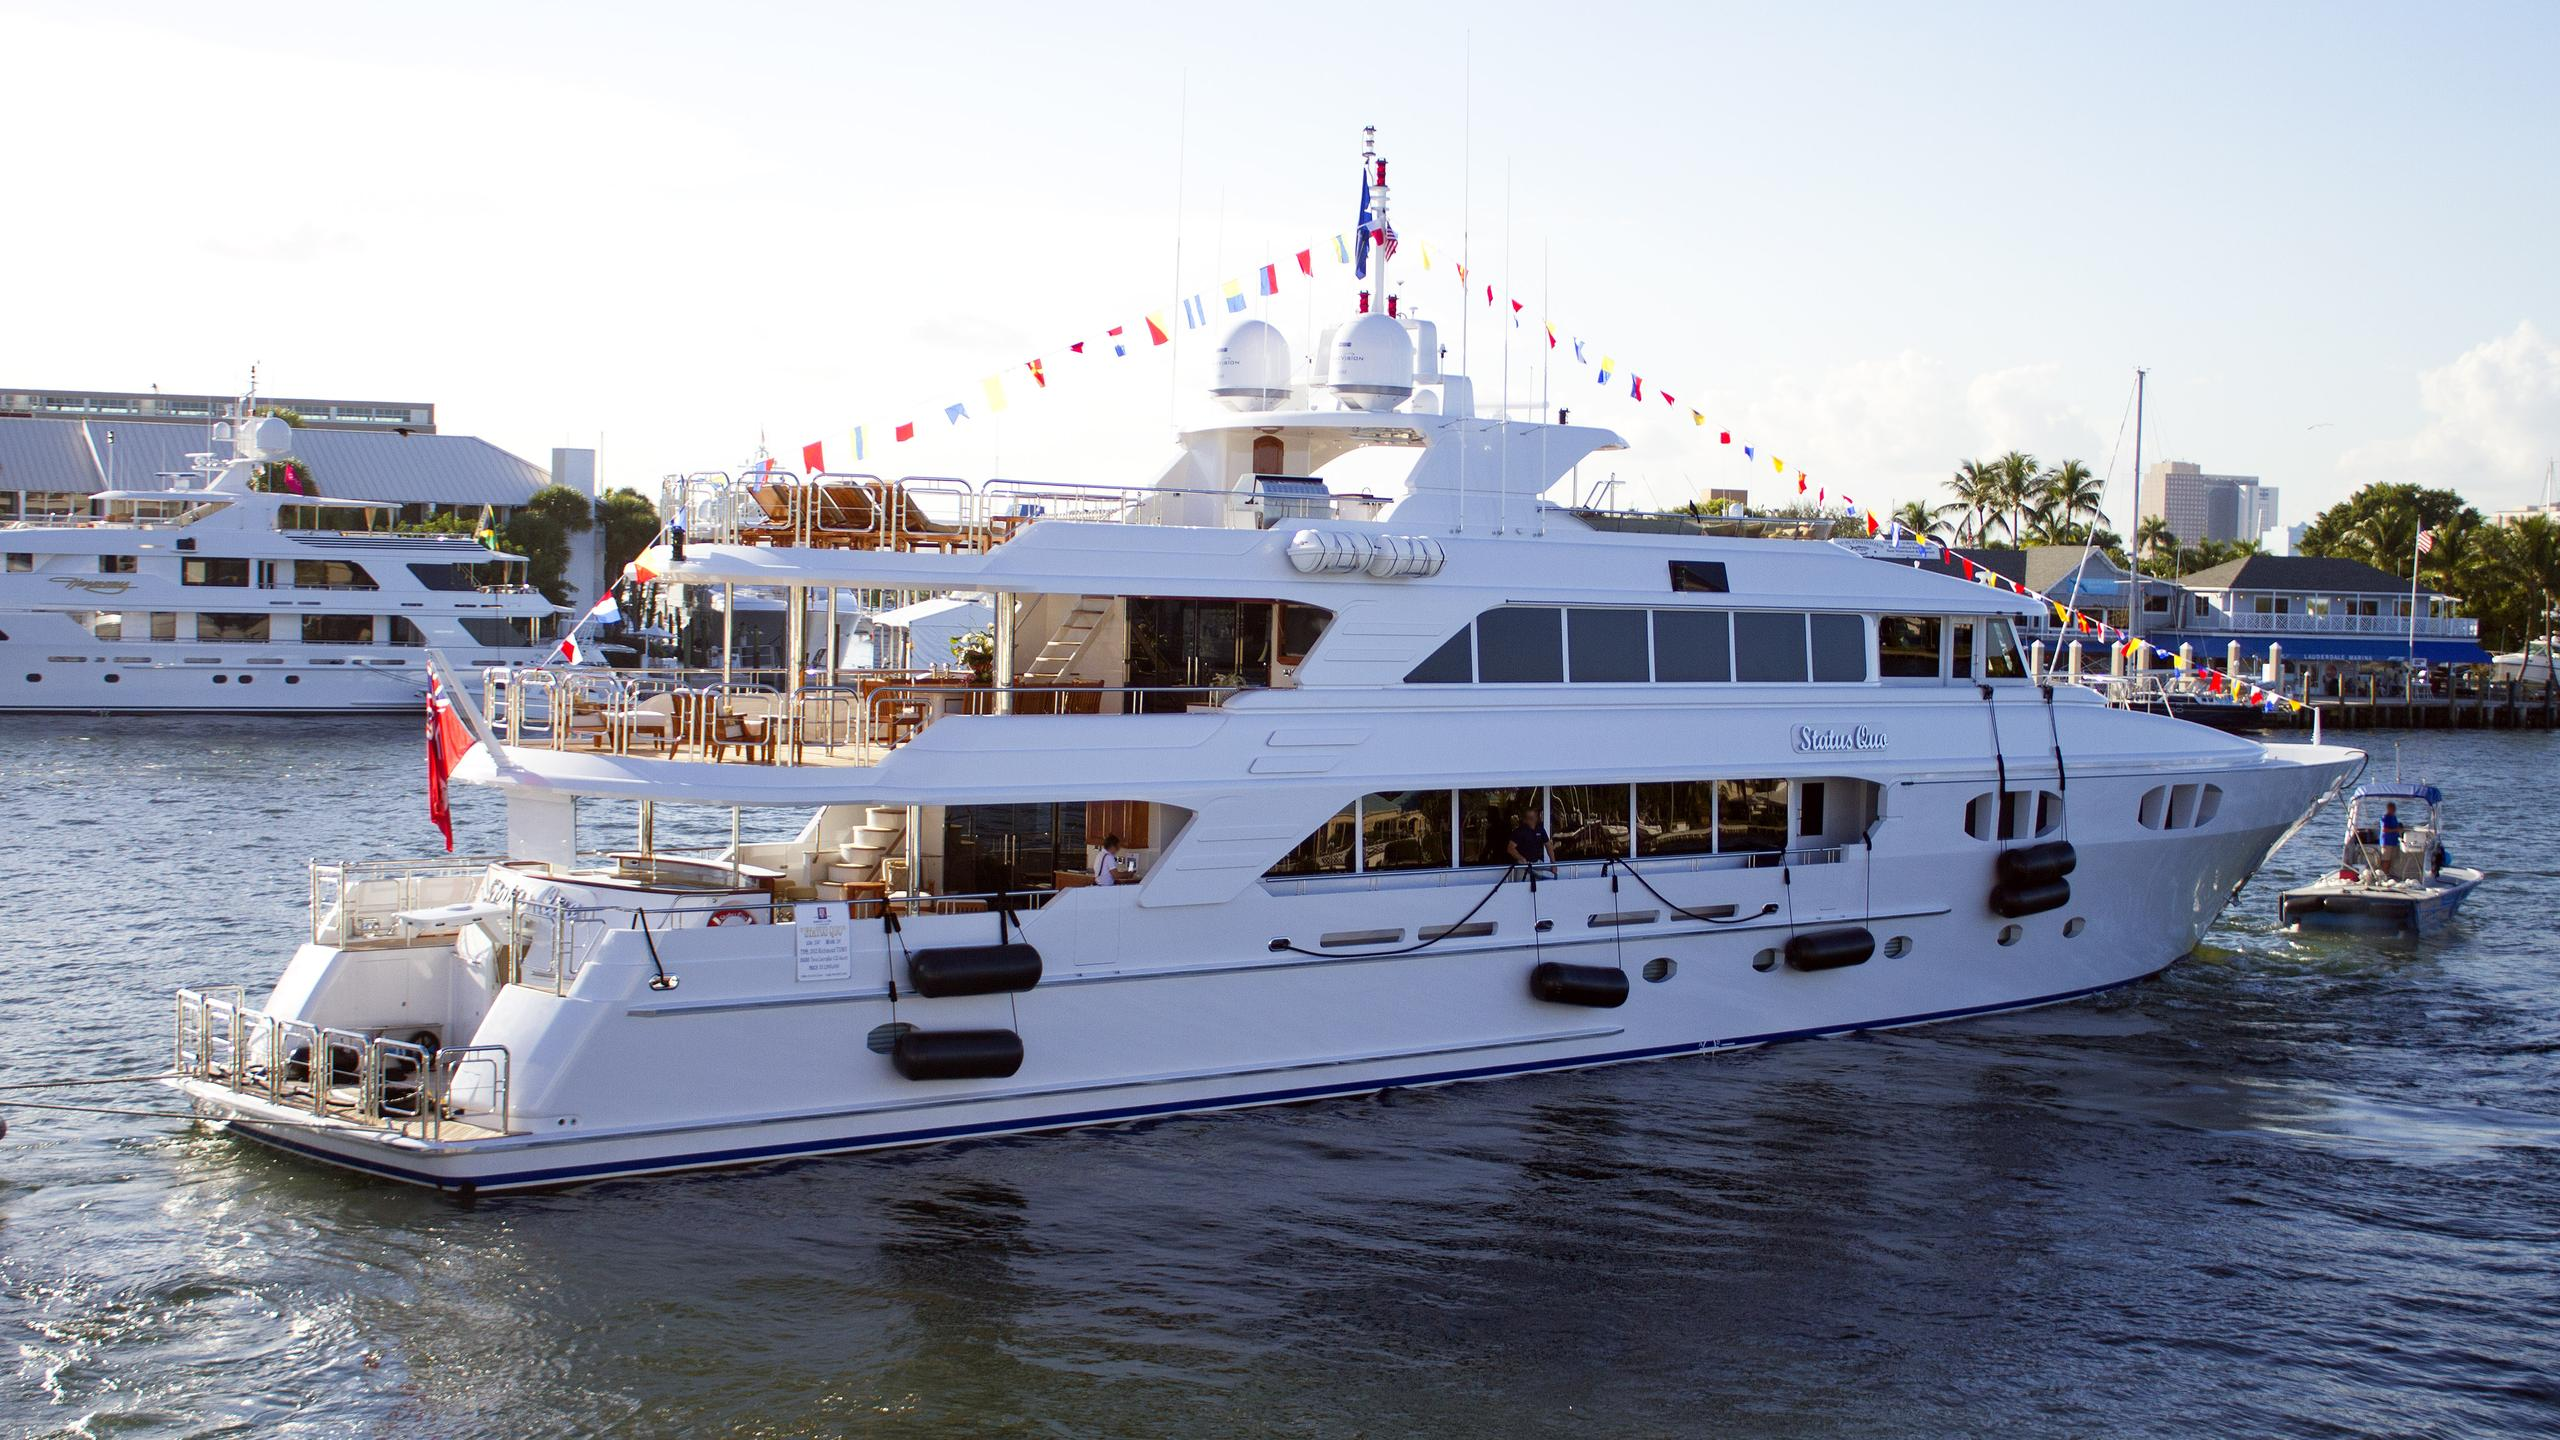 status-quo-motor-yacht-richmond-142-2013-46m-half-profile